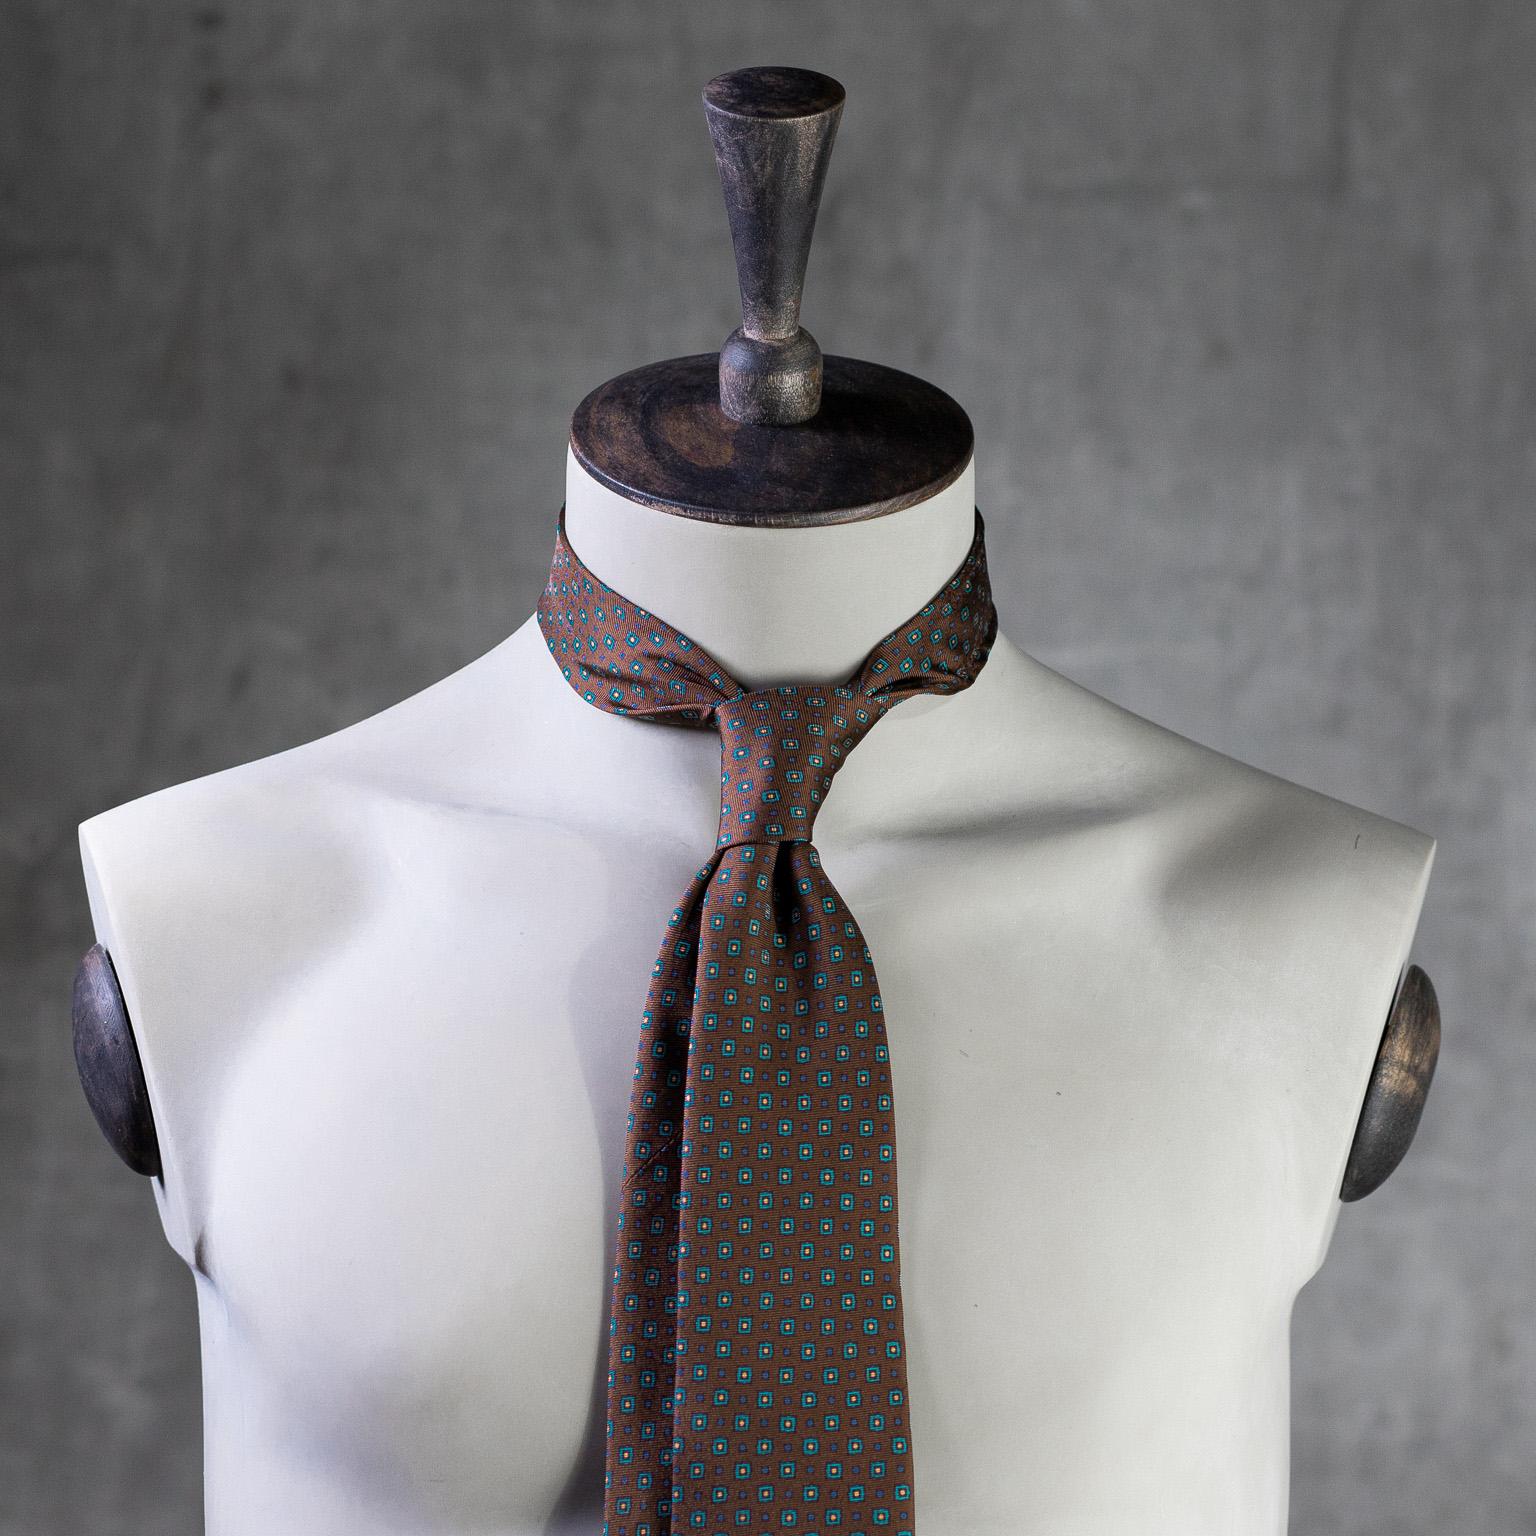 PRINTED-SILK-SEDA-ESTAMPADA-0588-Tie-Initials-Corbata-Iniciales-The-Seelk-2